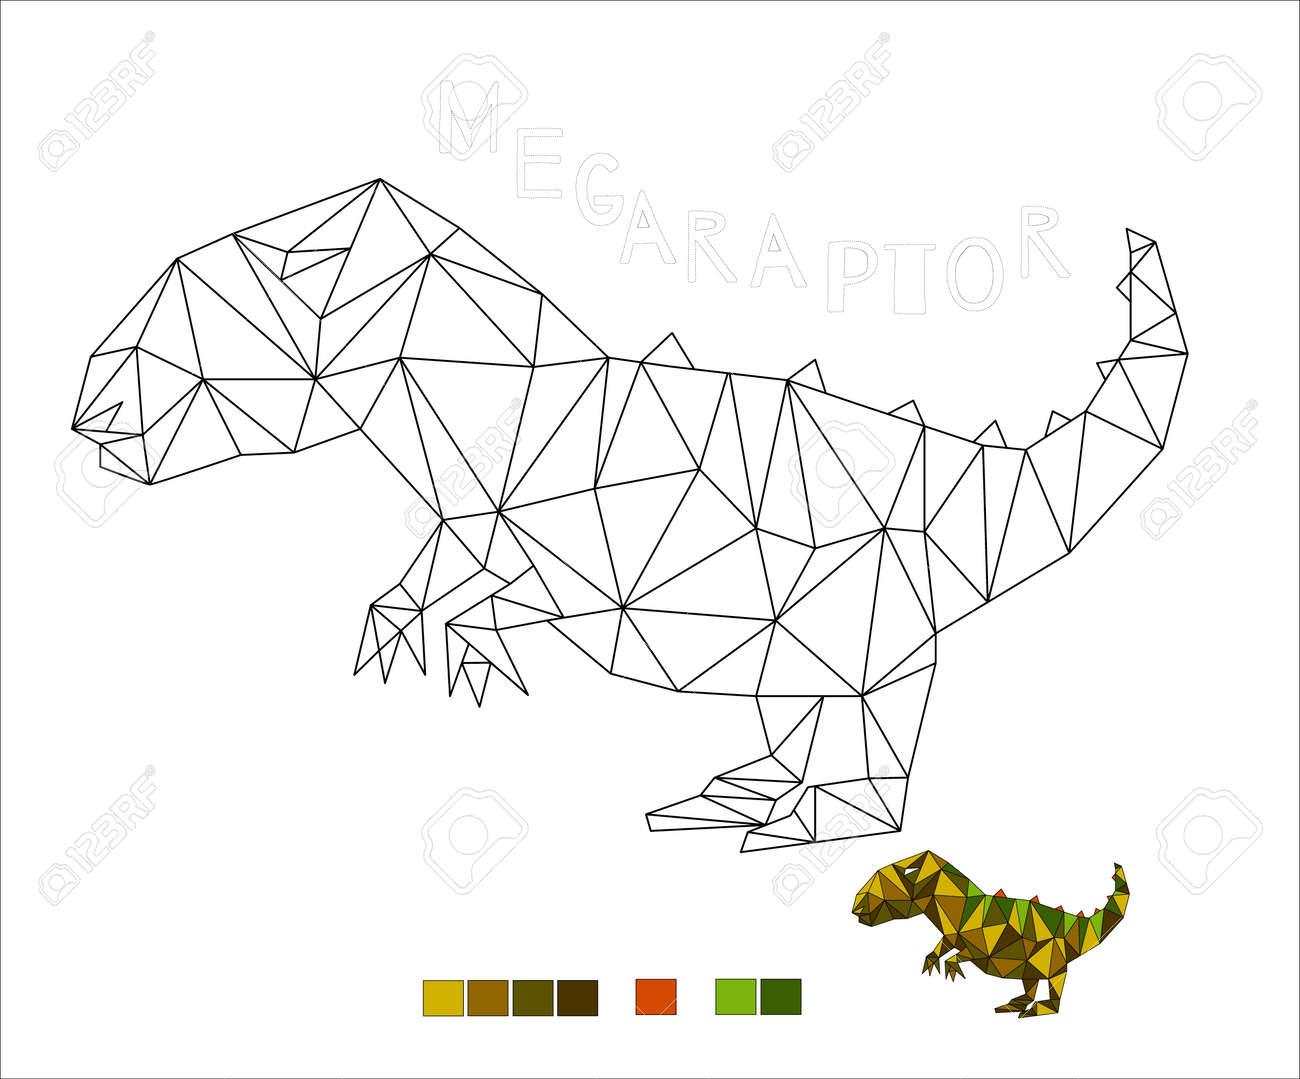 coloring Megaraptor dinosaur vector illustration for kids - 171390854